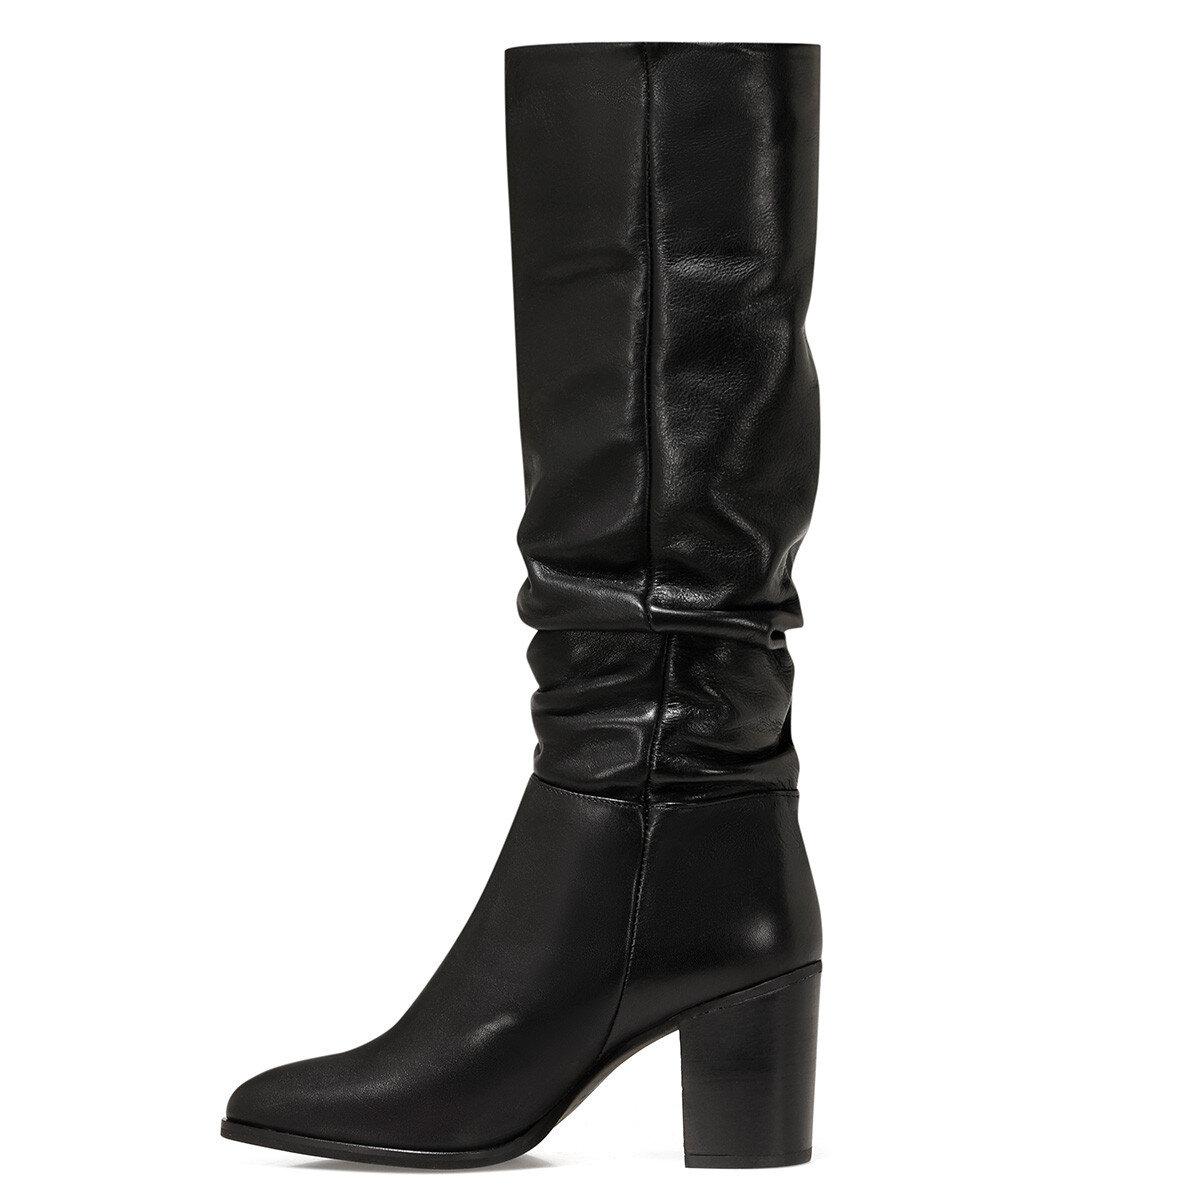 GAYDA Siyah Kadın Topuklu Çizme